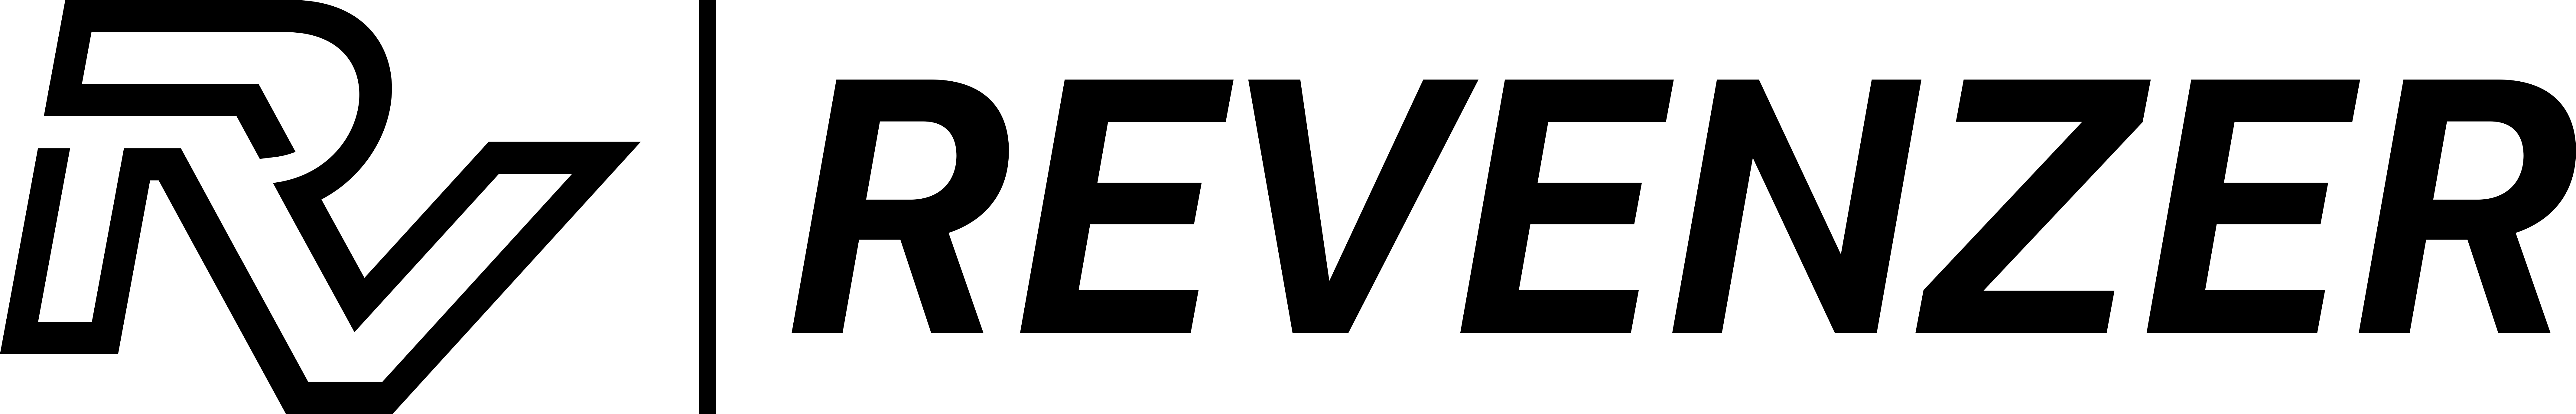 revenzer-logo